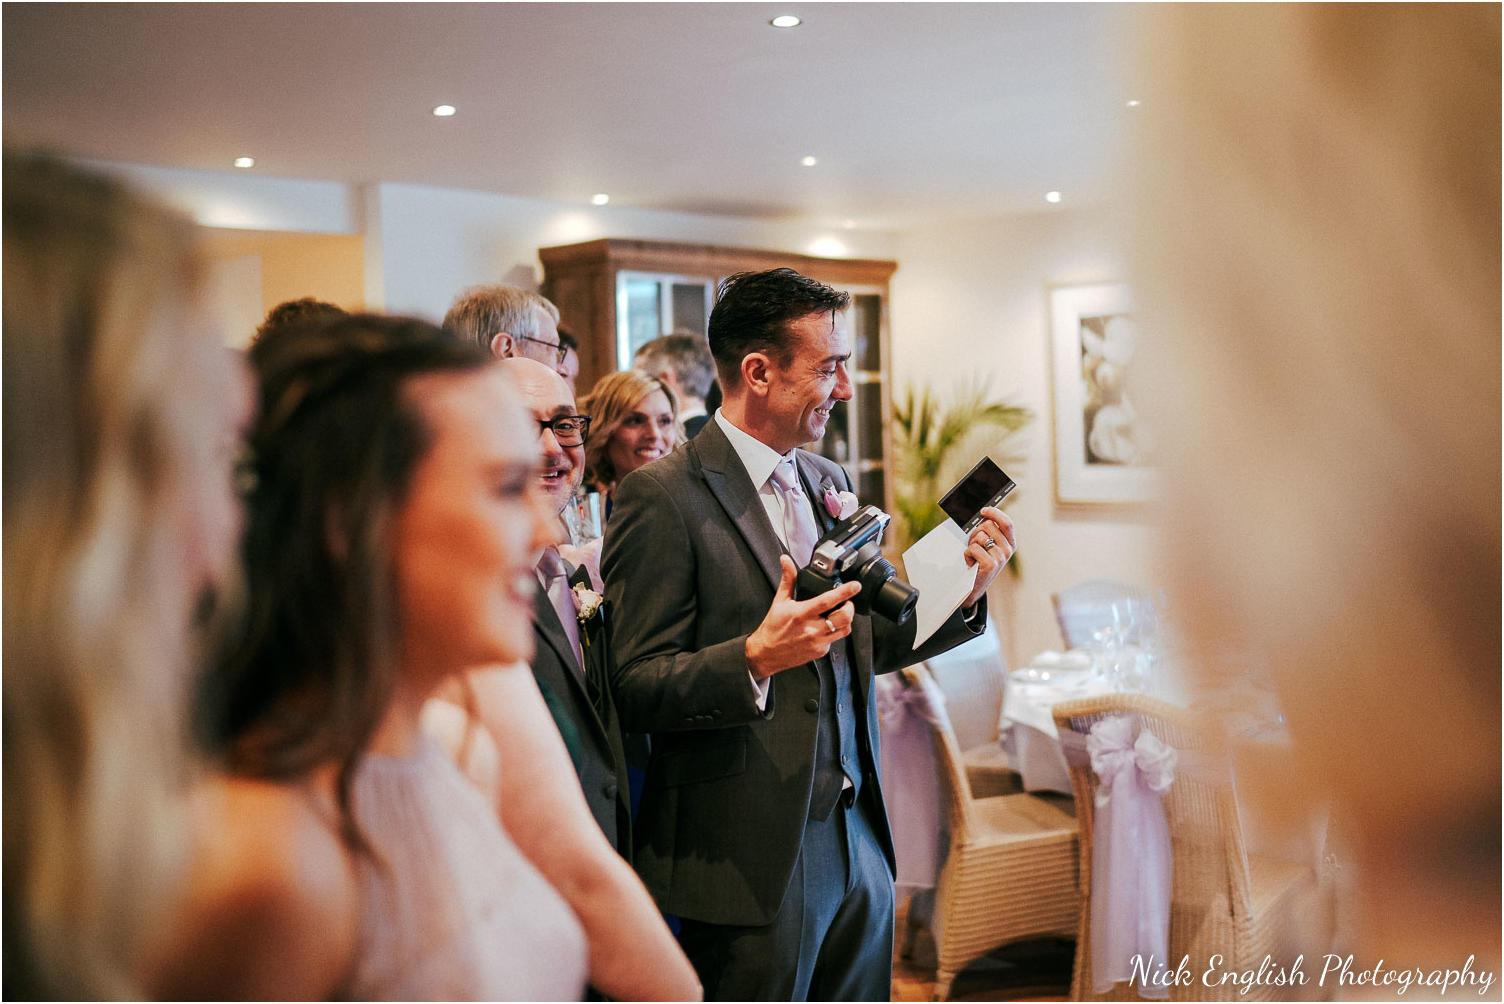 Mitton_Hall_Wedding_Photographer_2018-106.jpg